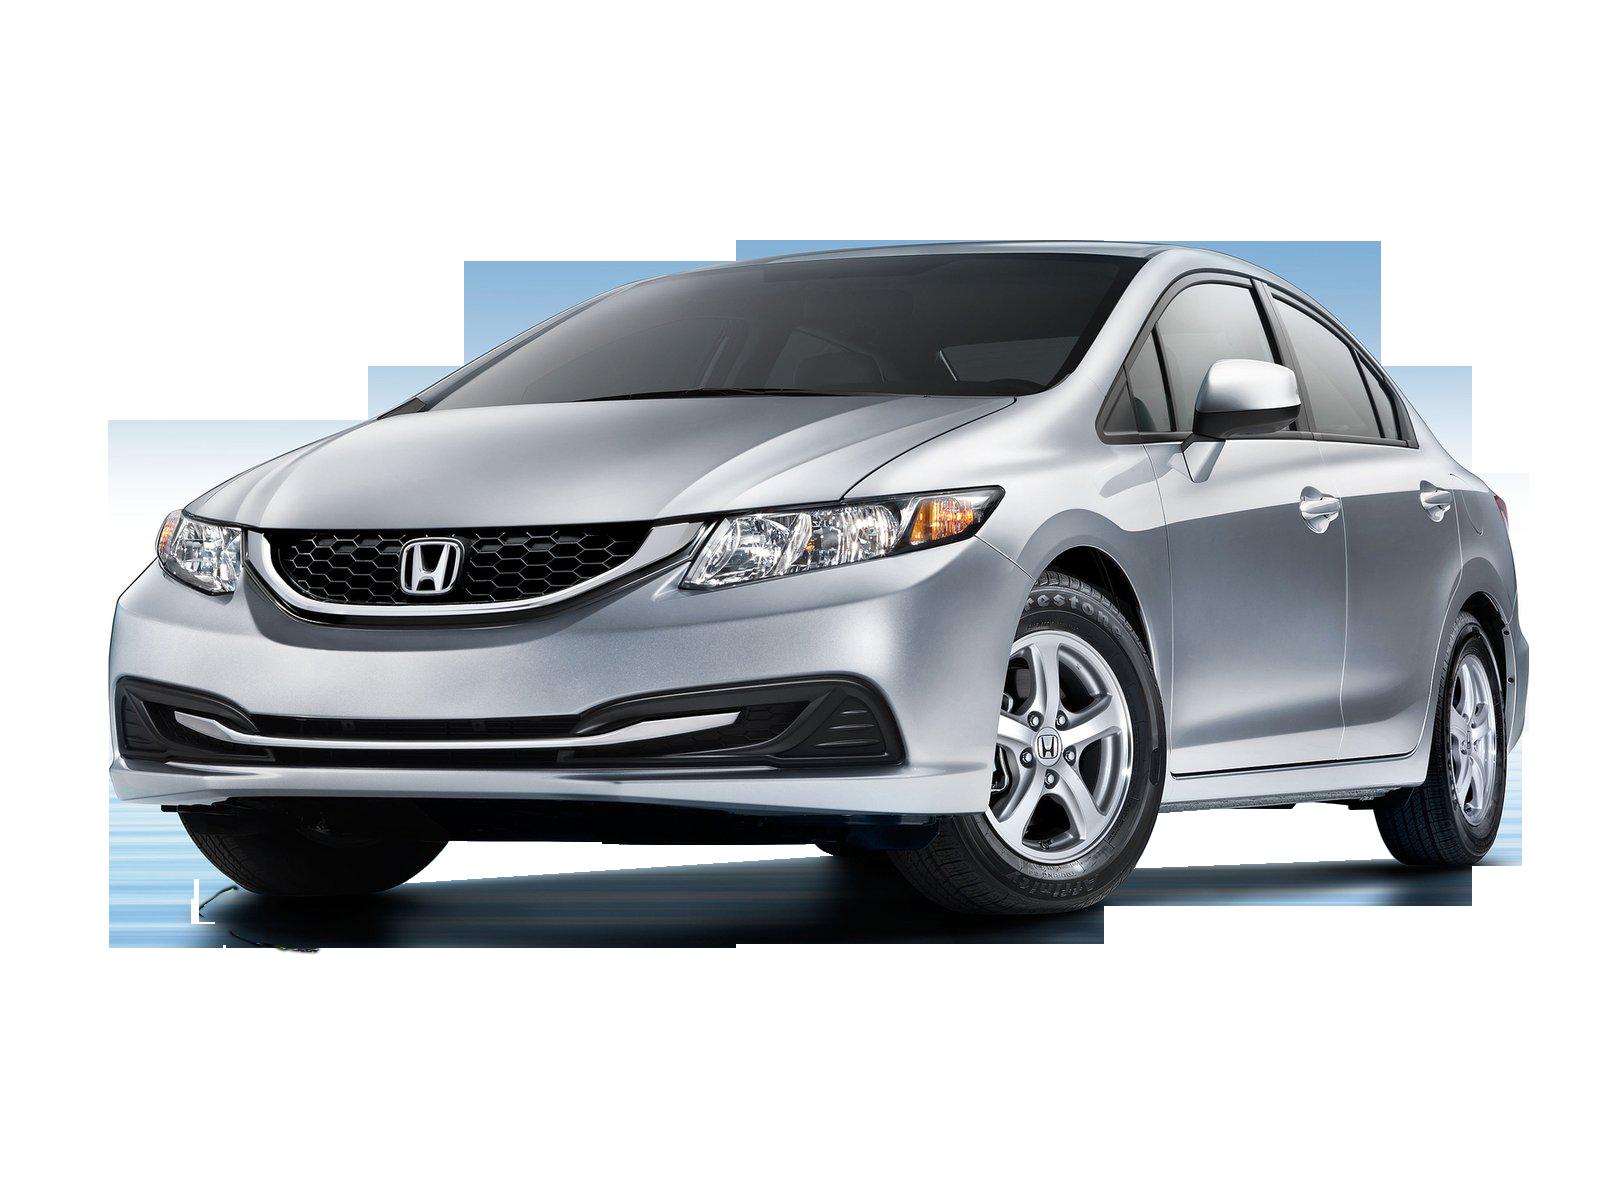 Honda Cars 2013 Honda Civic Sedan Honda Cars Civic Sedan